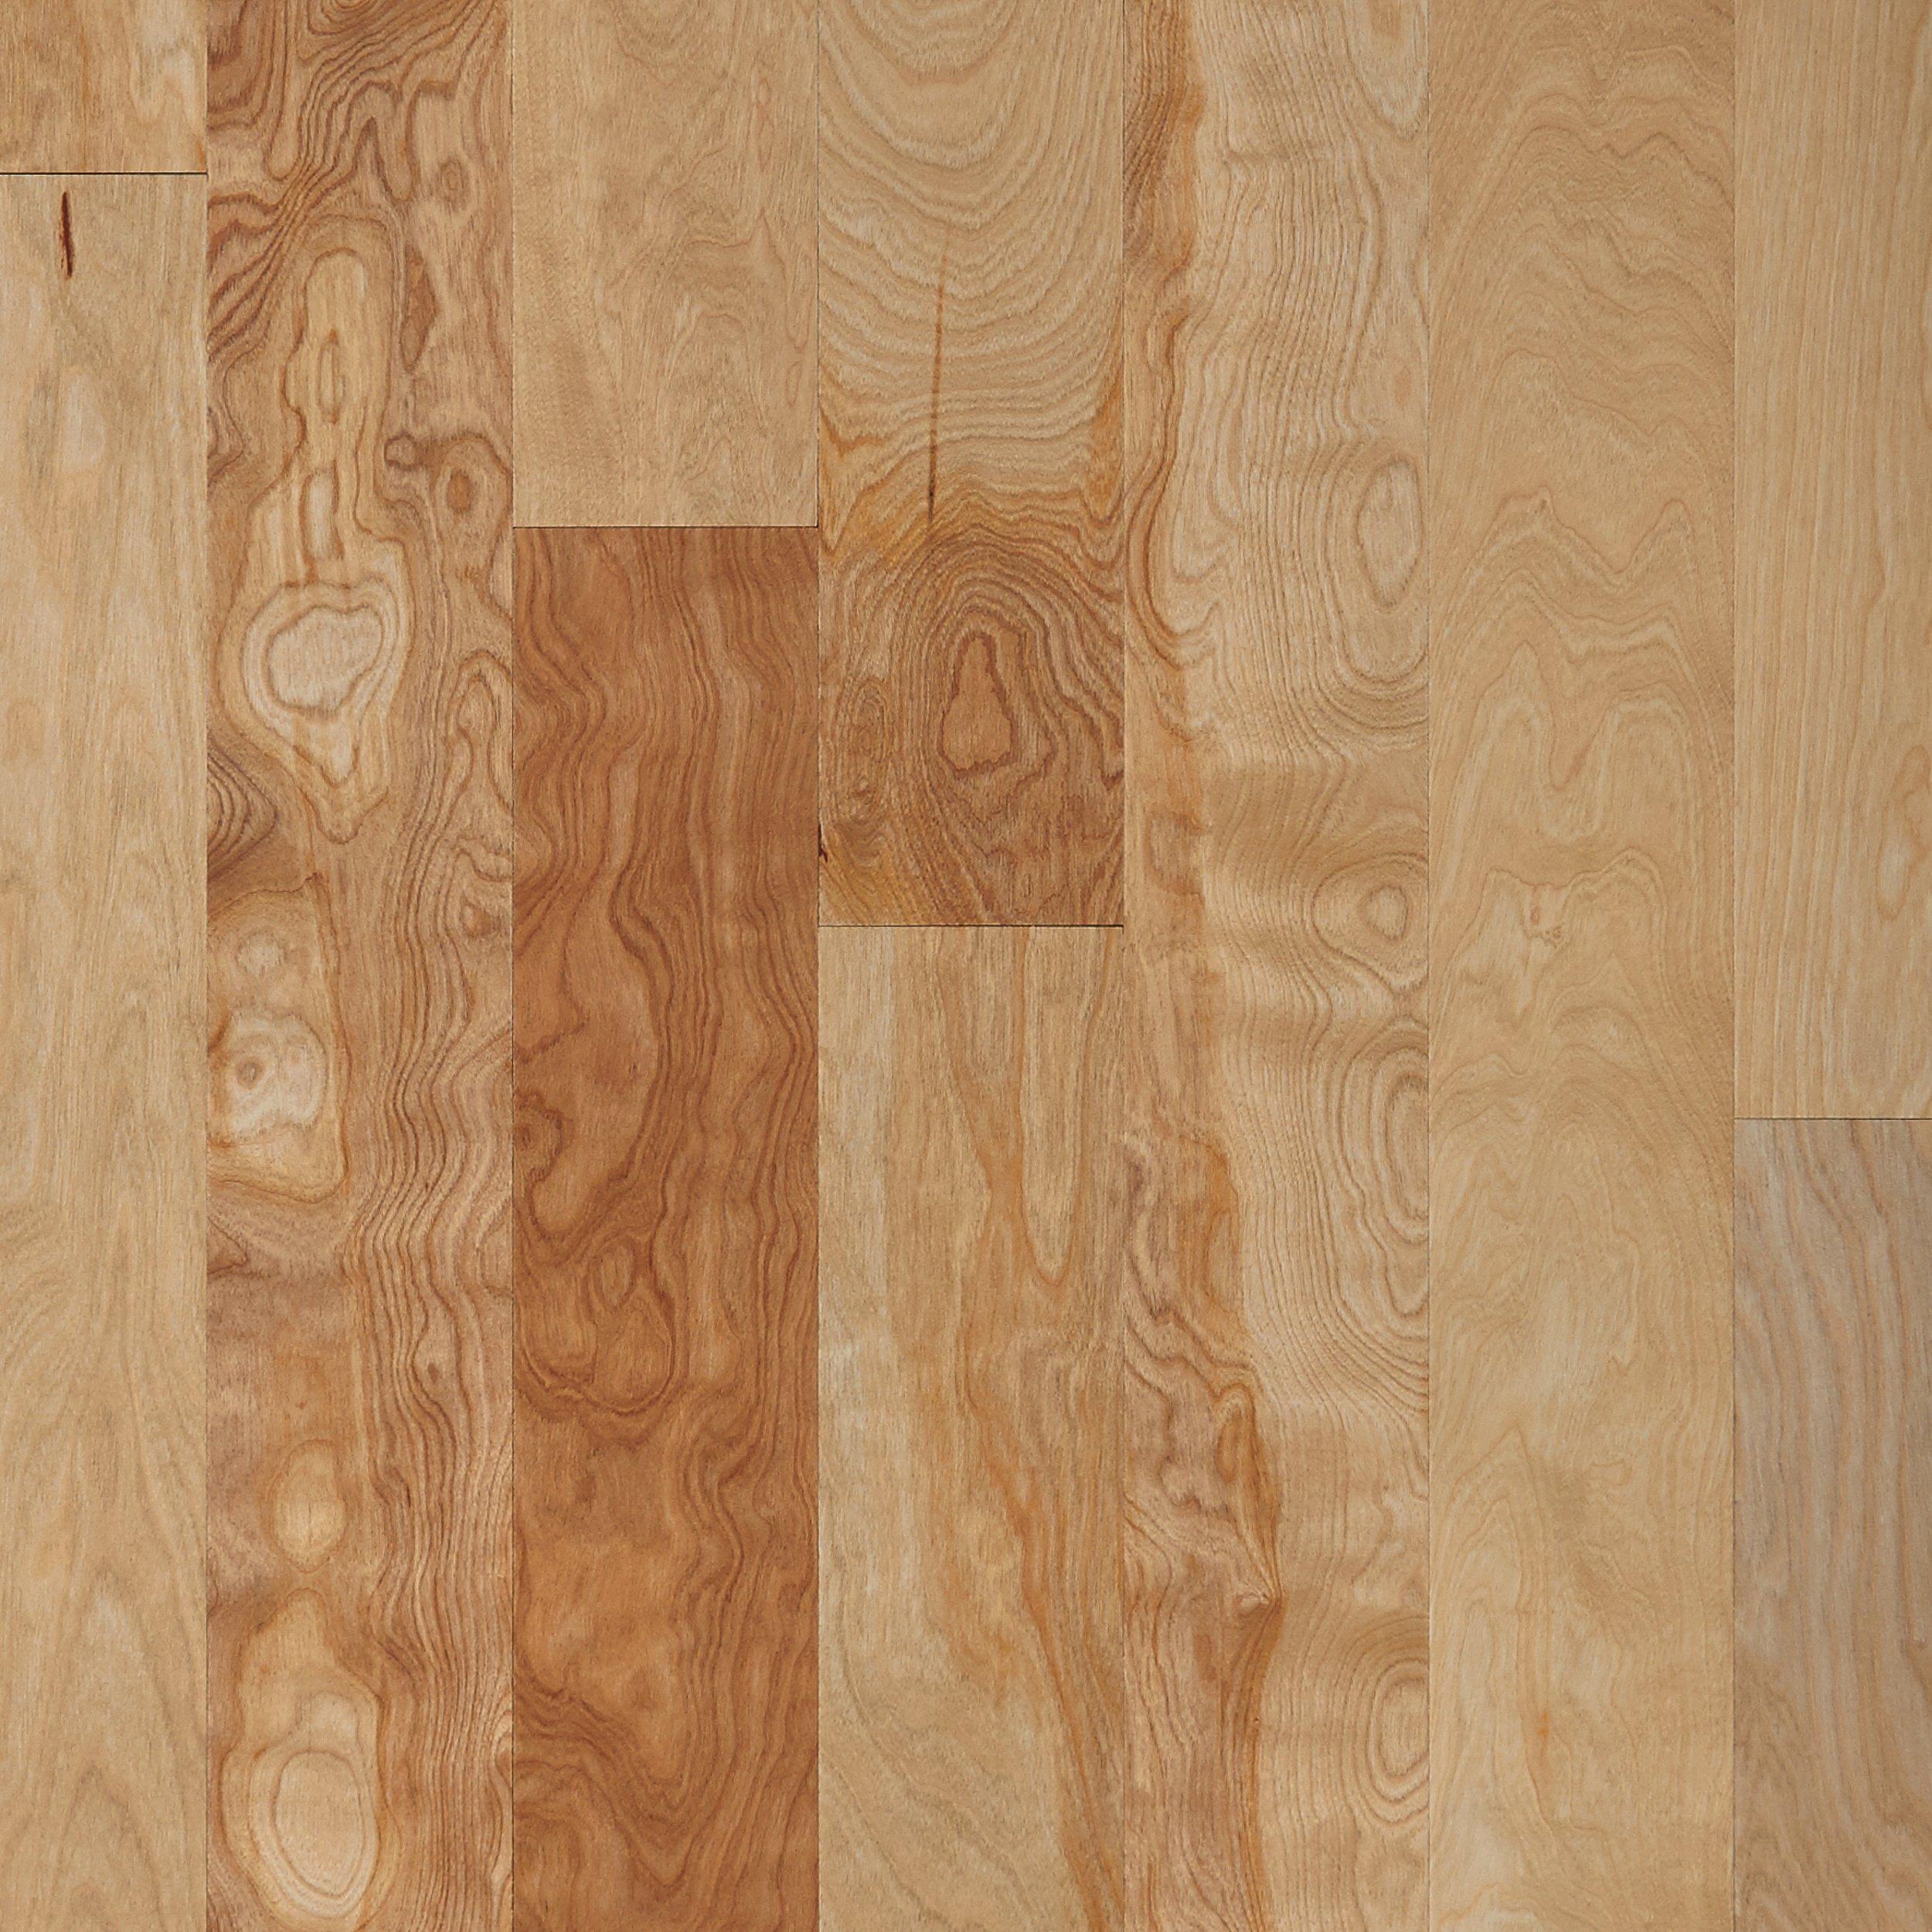 Reviews of engineered wood floors - Natural Birch Smooth Engineered Hardwood